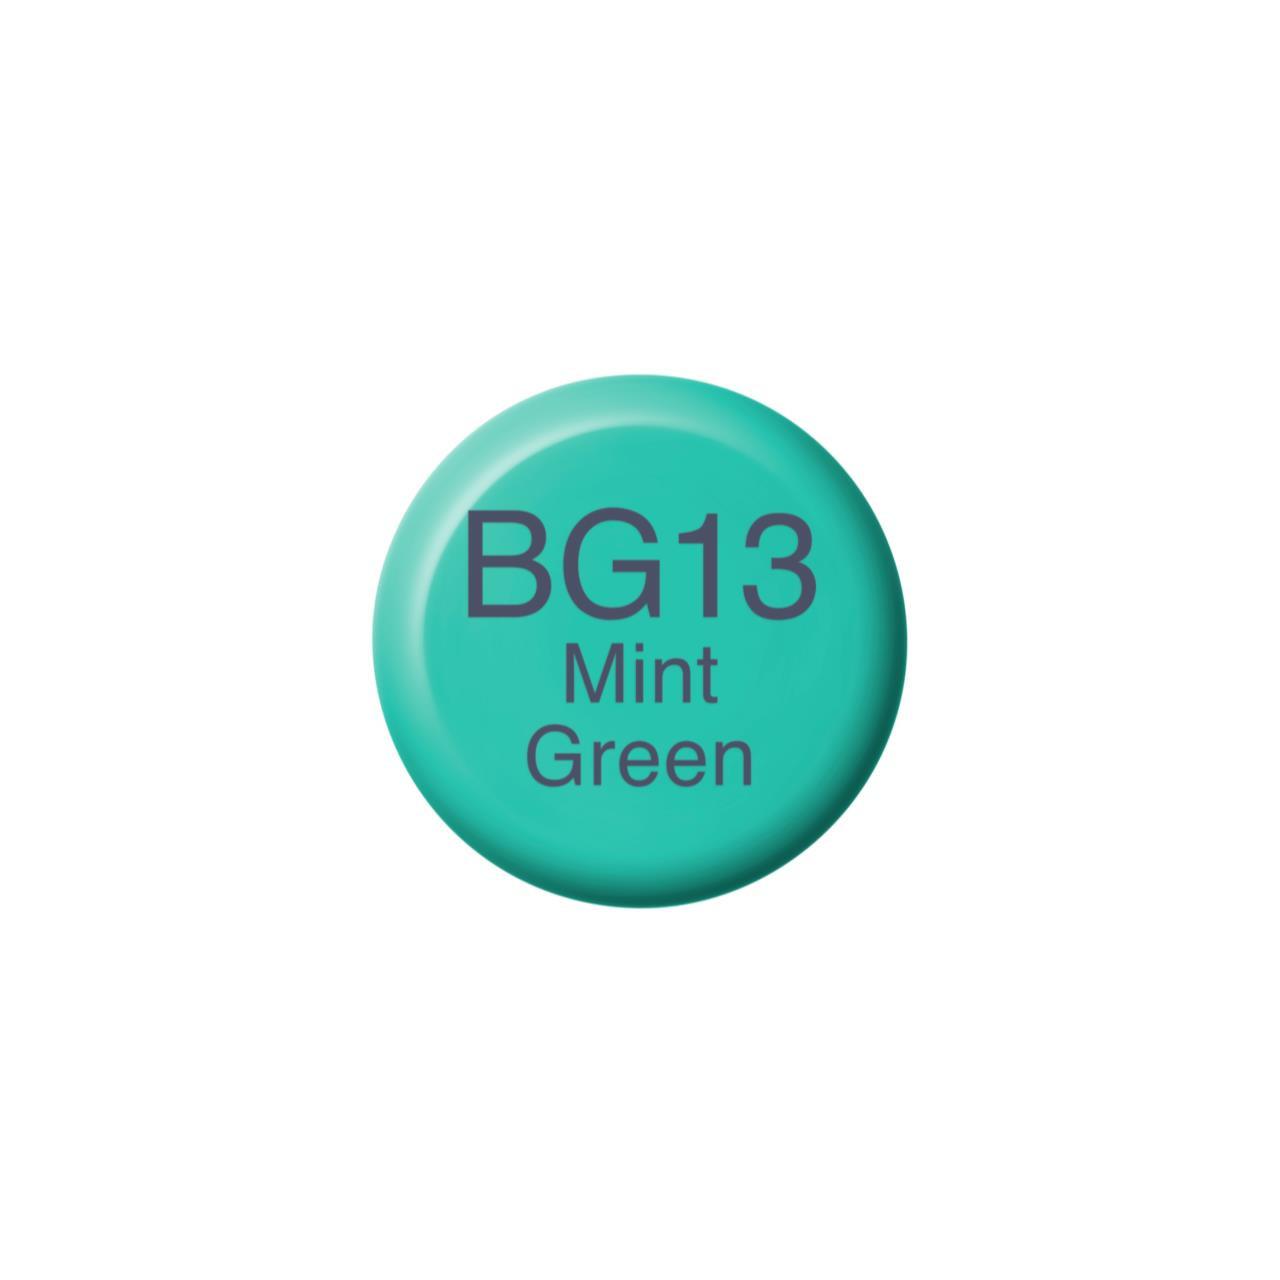 BG13 Mint Green, Copic Ink - 4511338056240